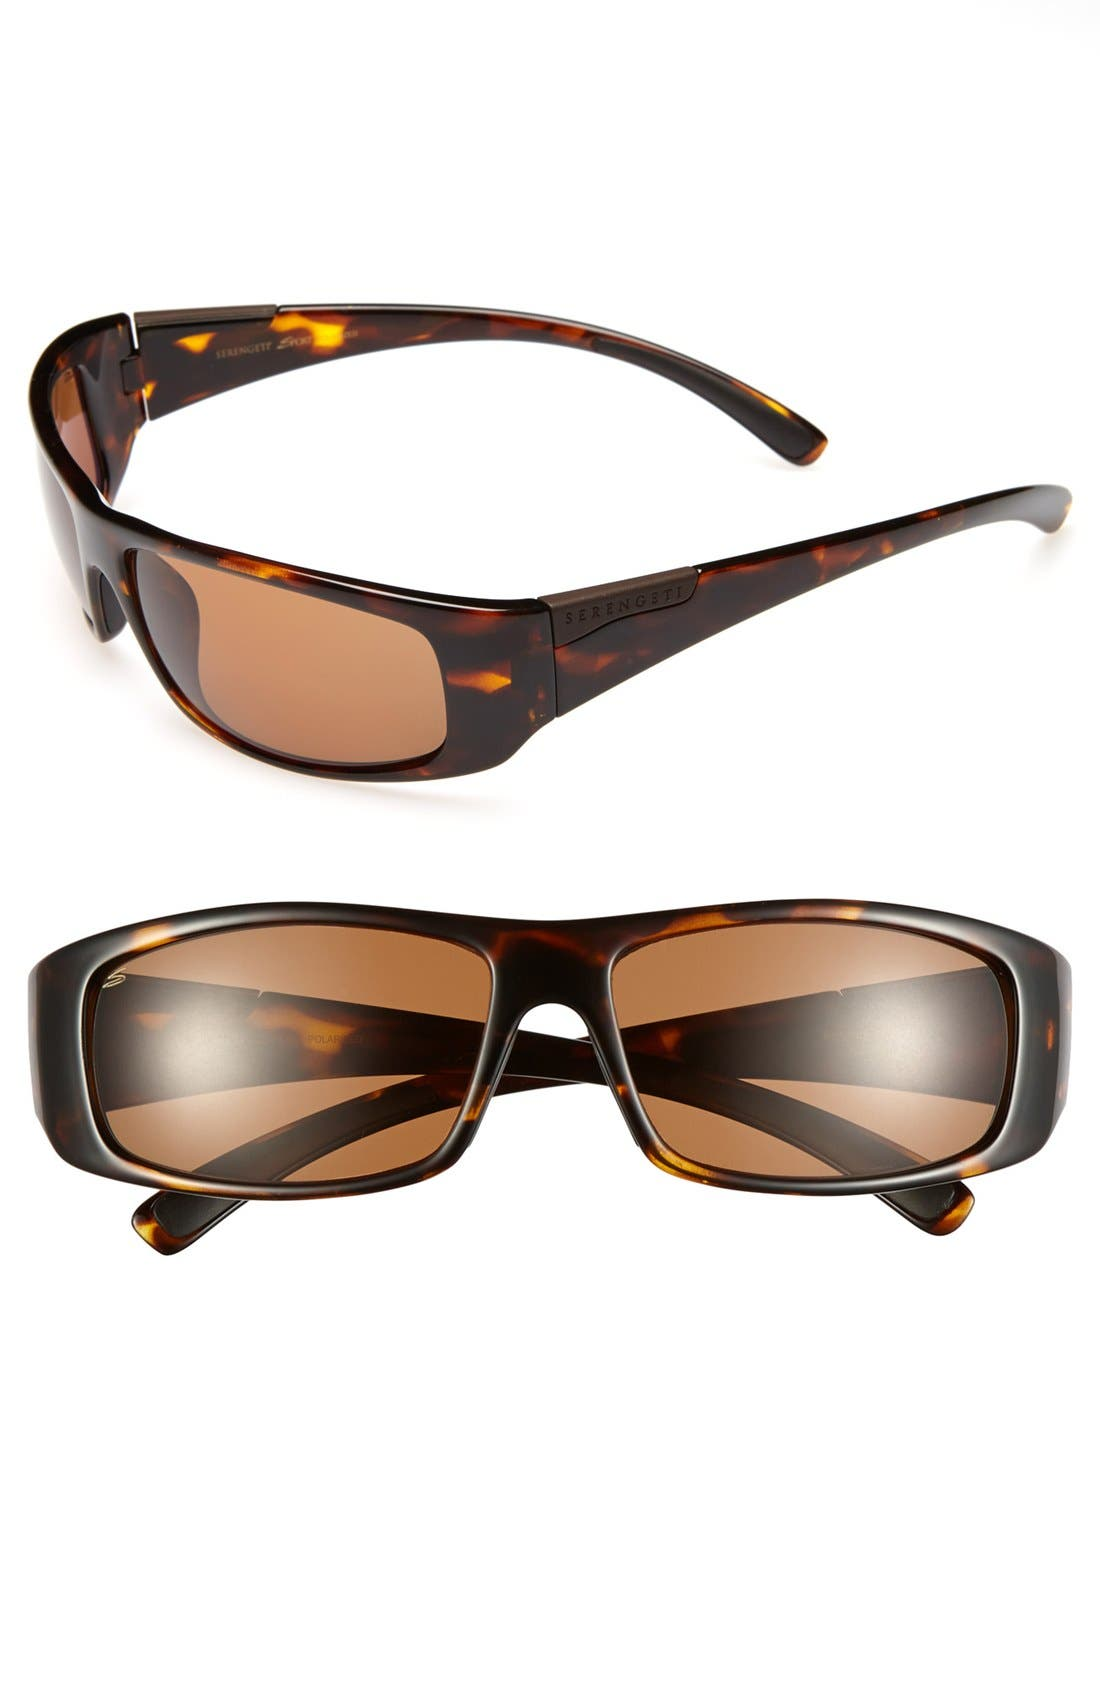 Main Image - Serengeti 'Fasano' 65mm Polarized Sunglasses